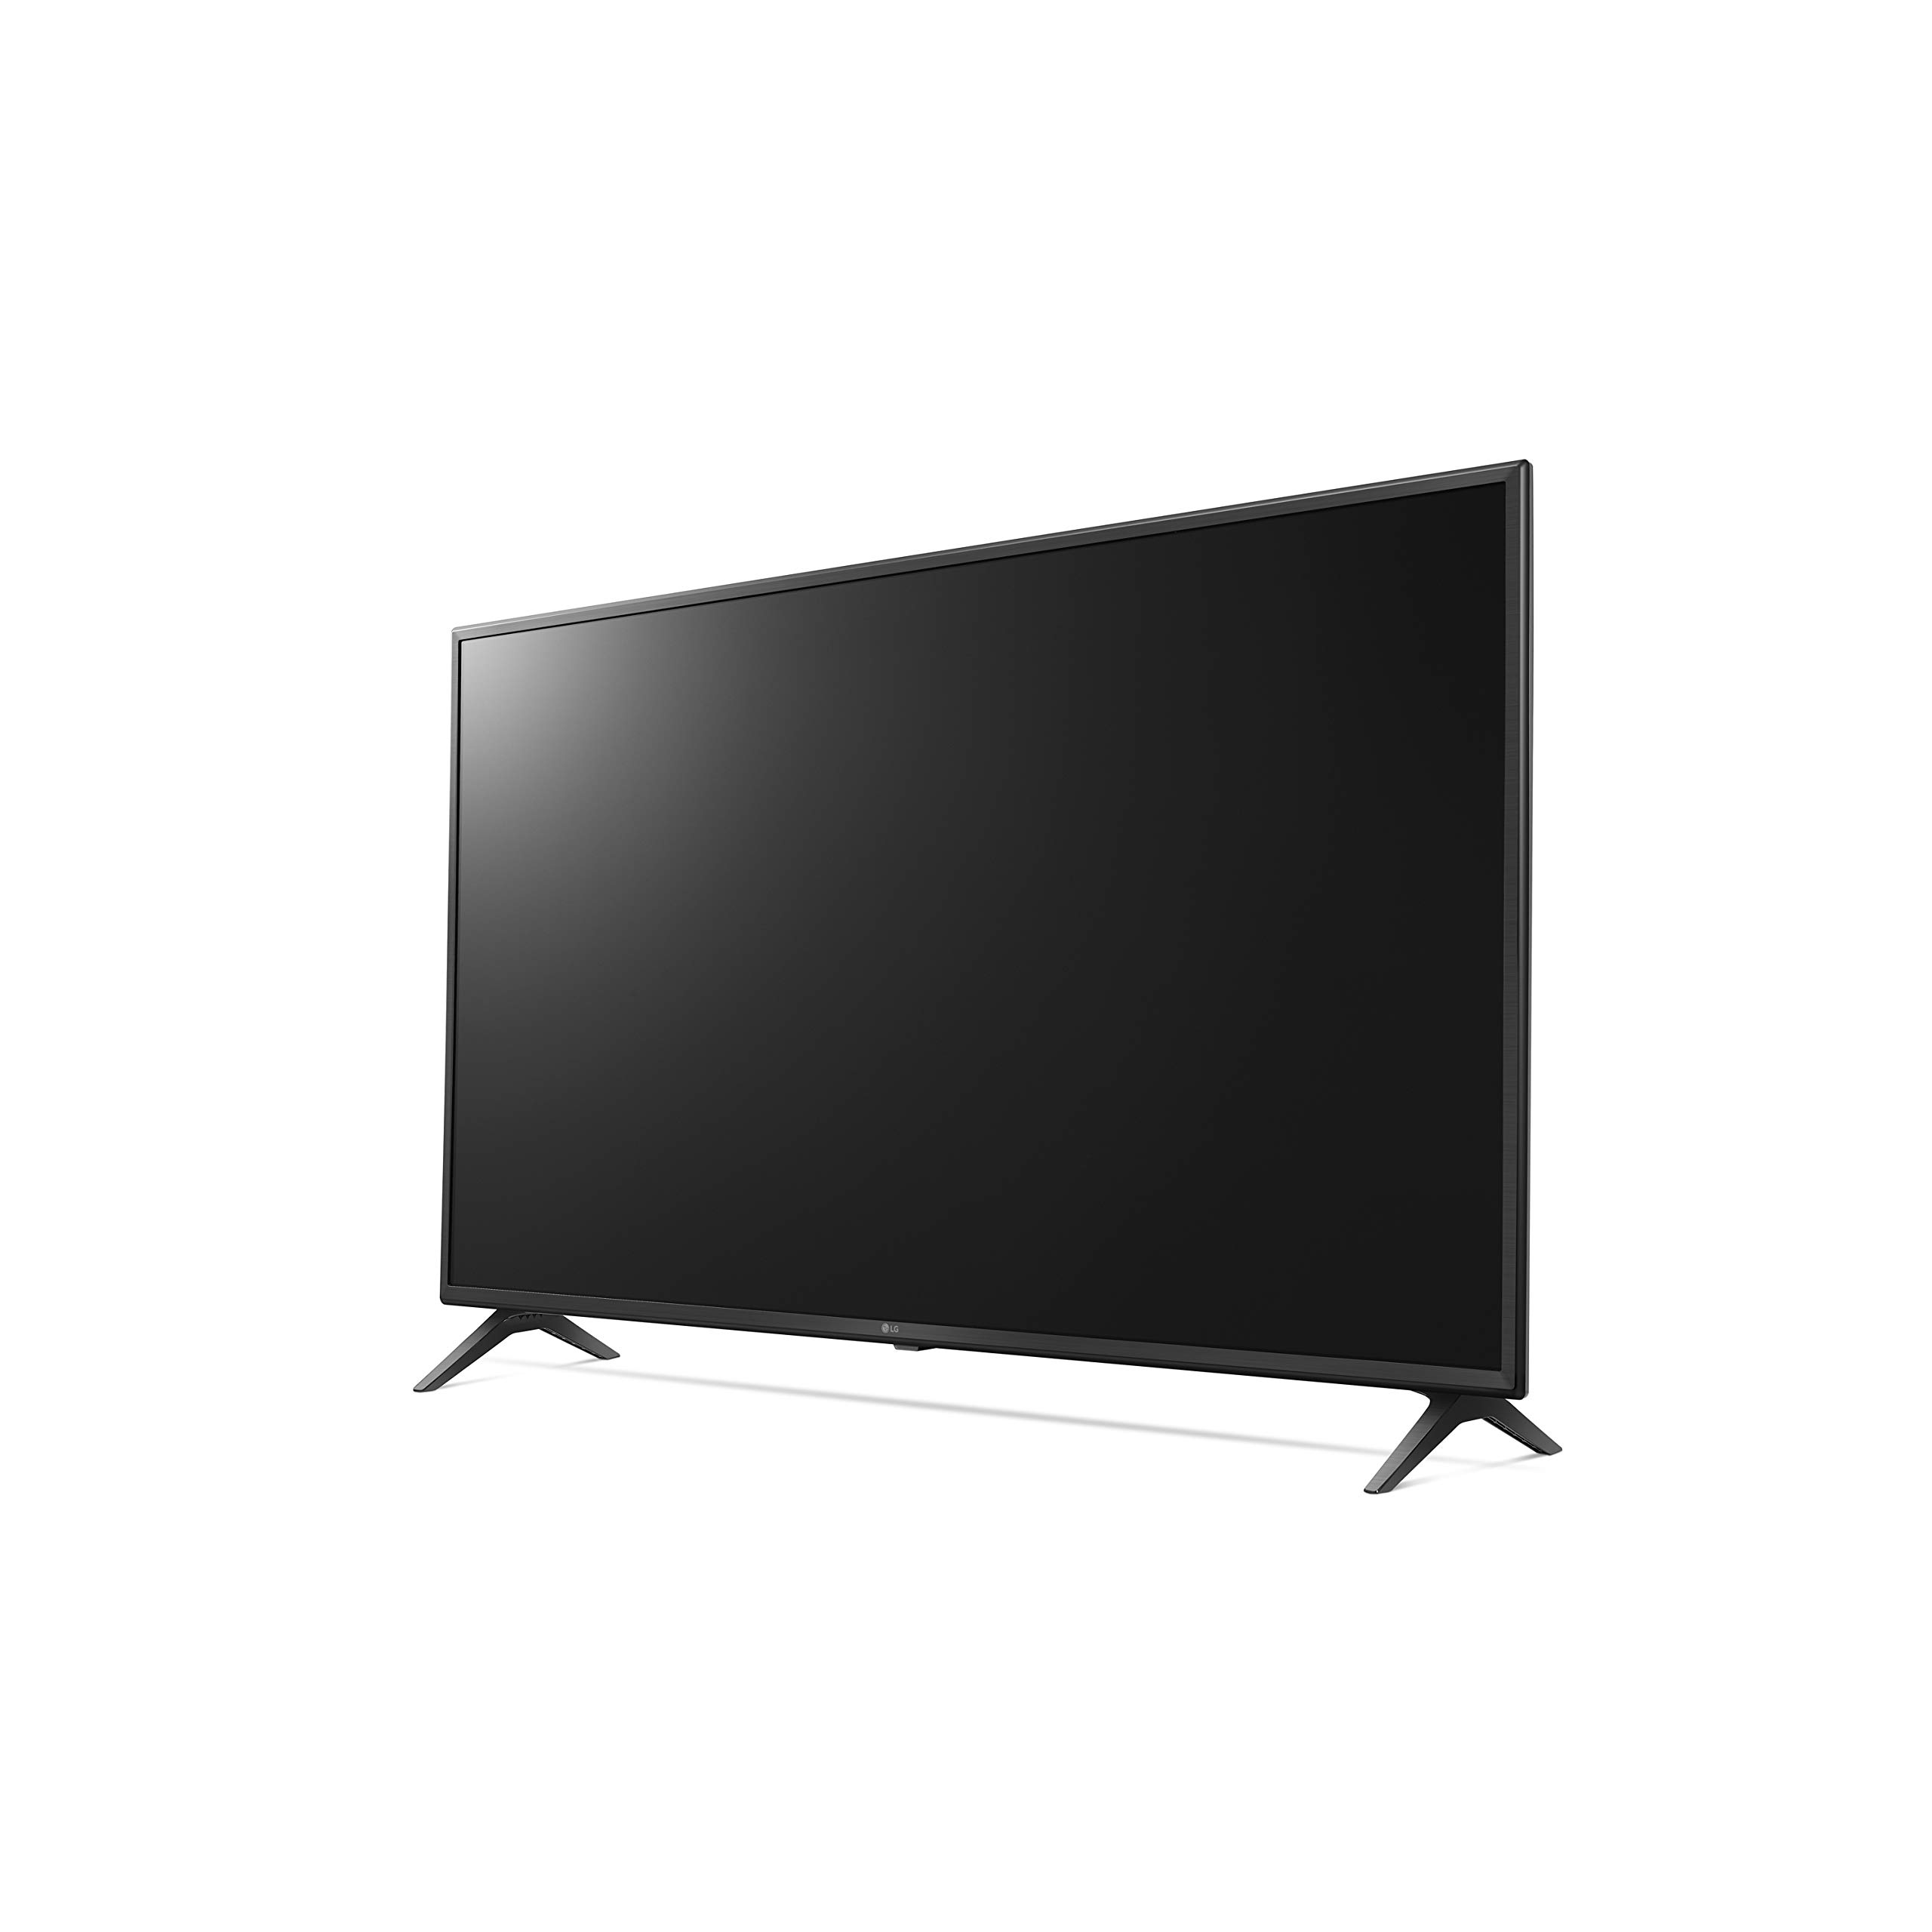 TELEVISOR 49 49UM7000 UHD STV IPS 1600PMI IA BT Quad LG: Lg: Amazon.es: Electrónica